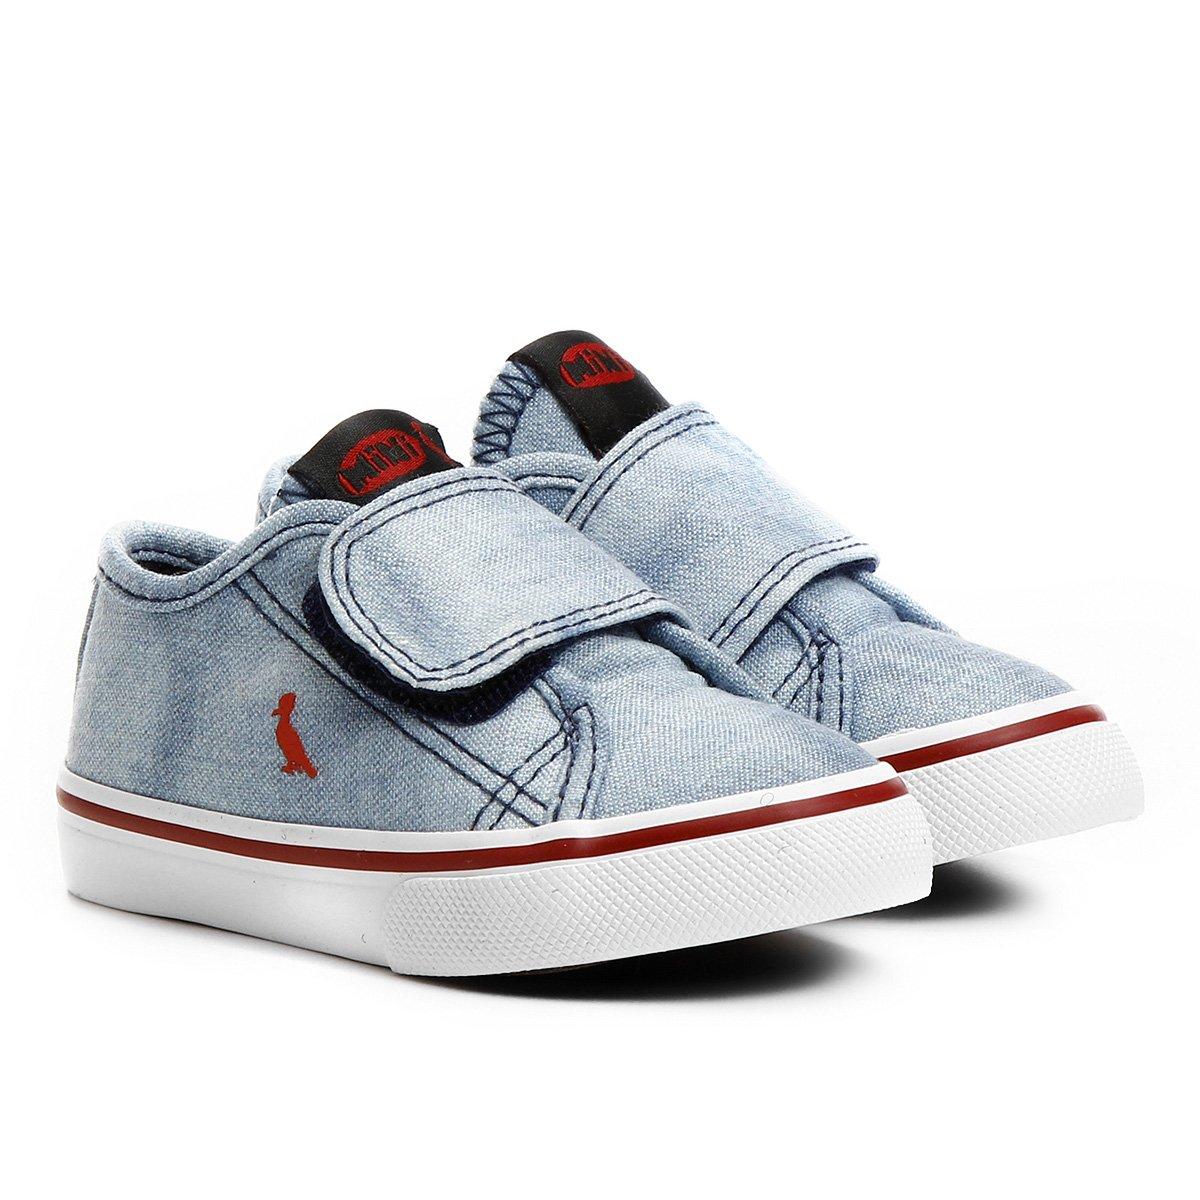 Tênis Reserva Mini Baby Infantil - Jeans Claro - Compre Agora  075875c114651